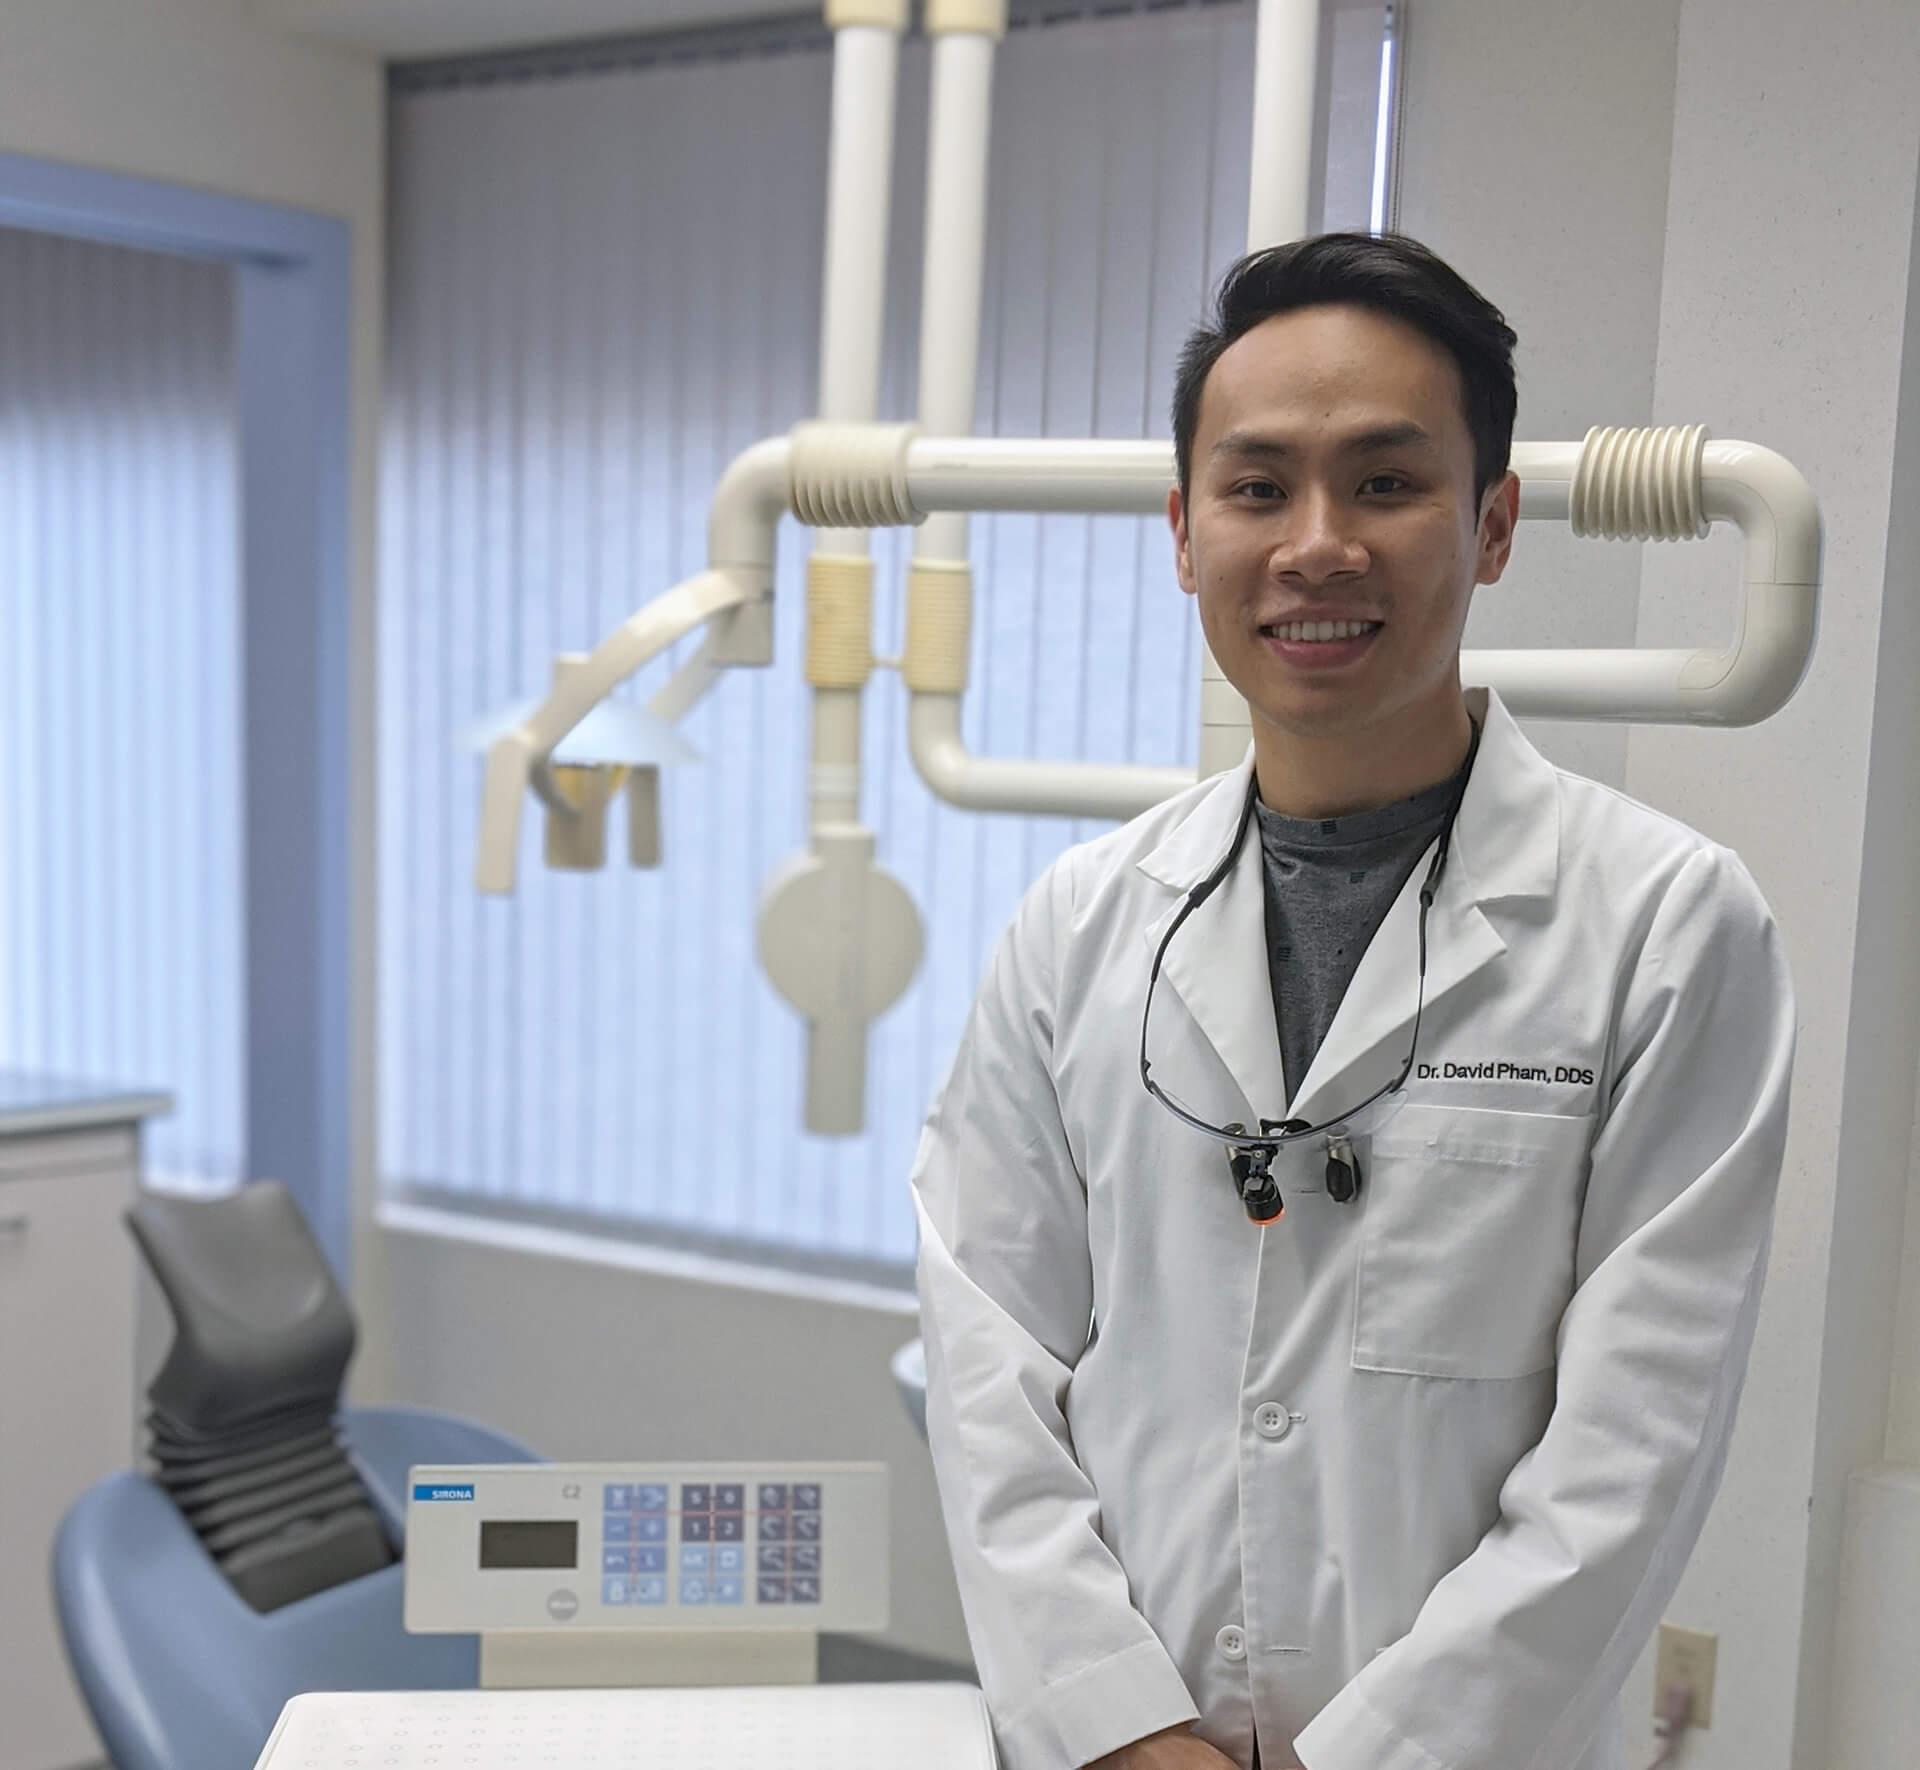 Dr. David Pham, HBSc, DDS Principal Dentist